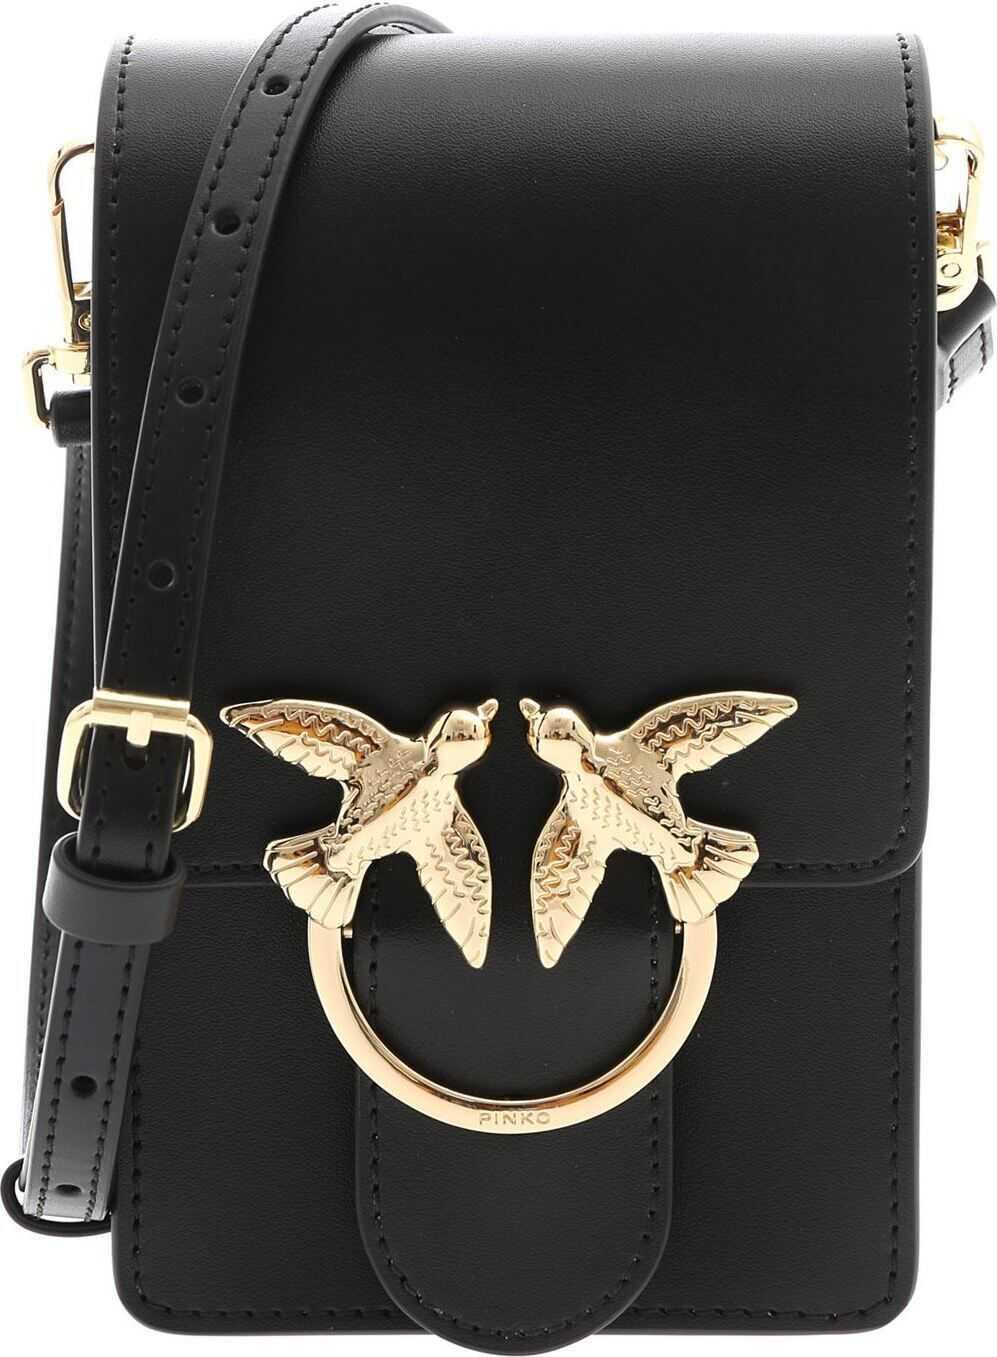 Pinko Love Smart Simply Bag In Black Black